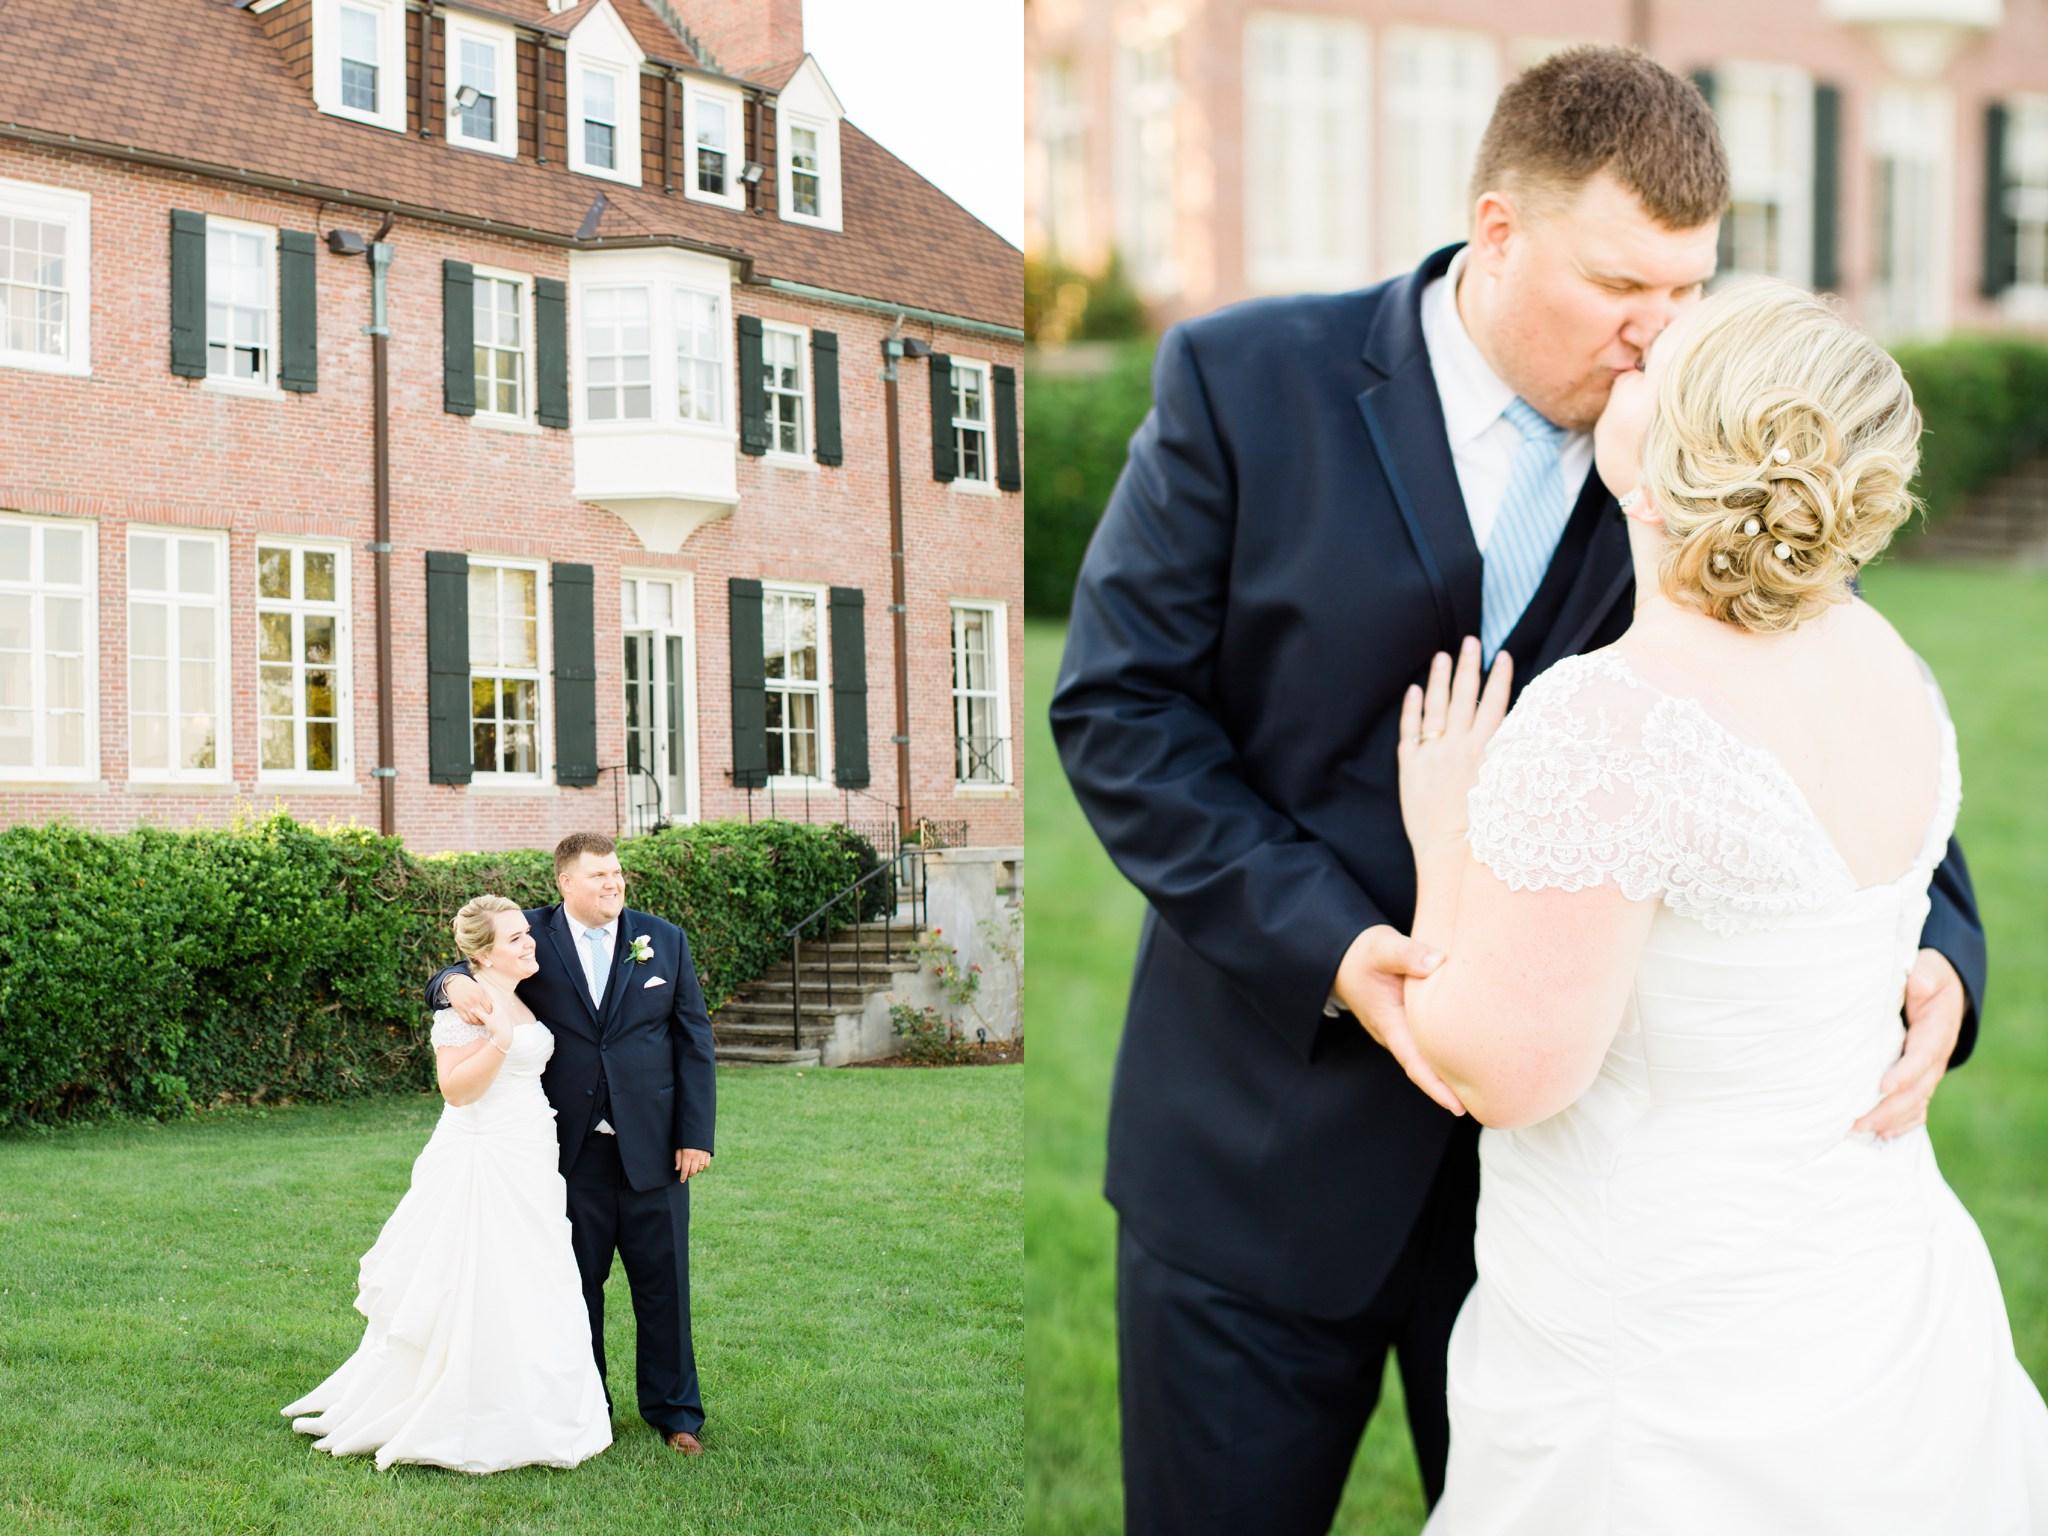 misselwood_endicott_college_wedding_photos_00074.JPG